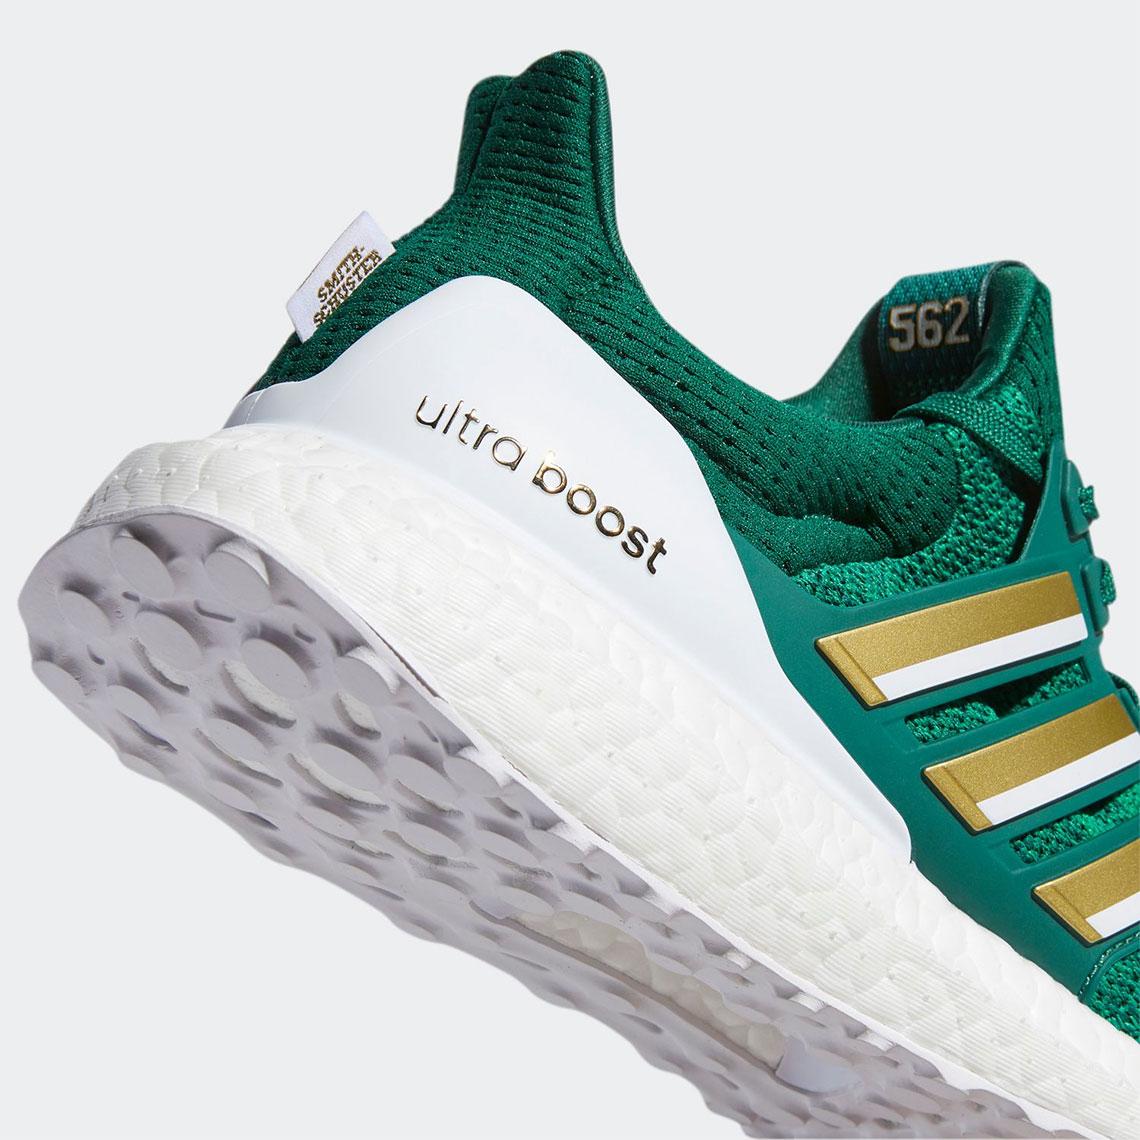 JuJu Smith-Schuster adidas Ultra Boost PE FZ5485   SneakerNews.com